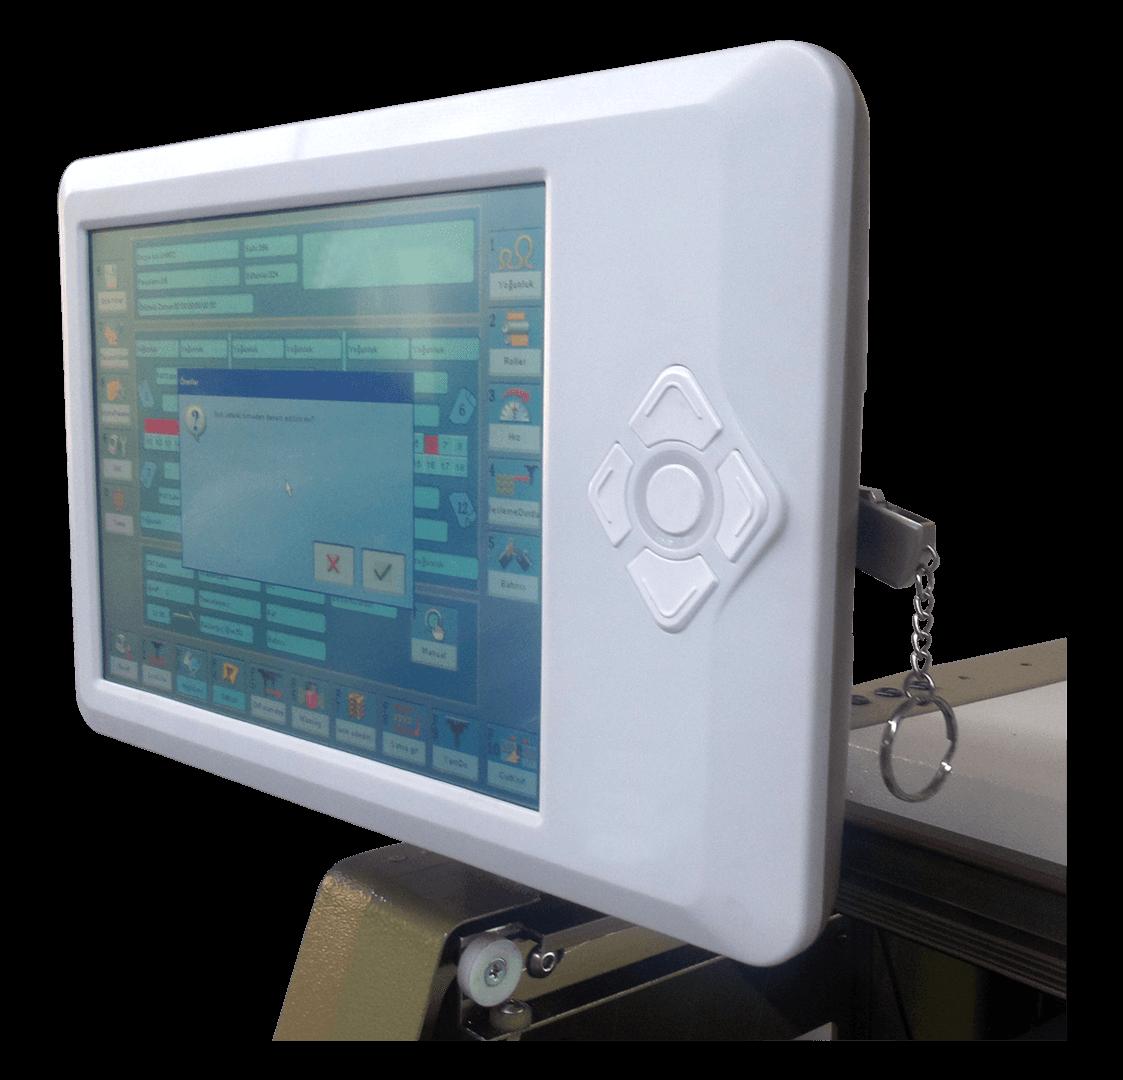 Yaka makinası kontrol paneli